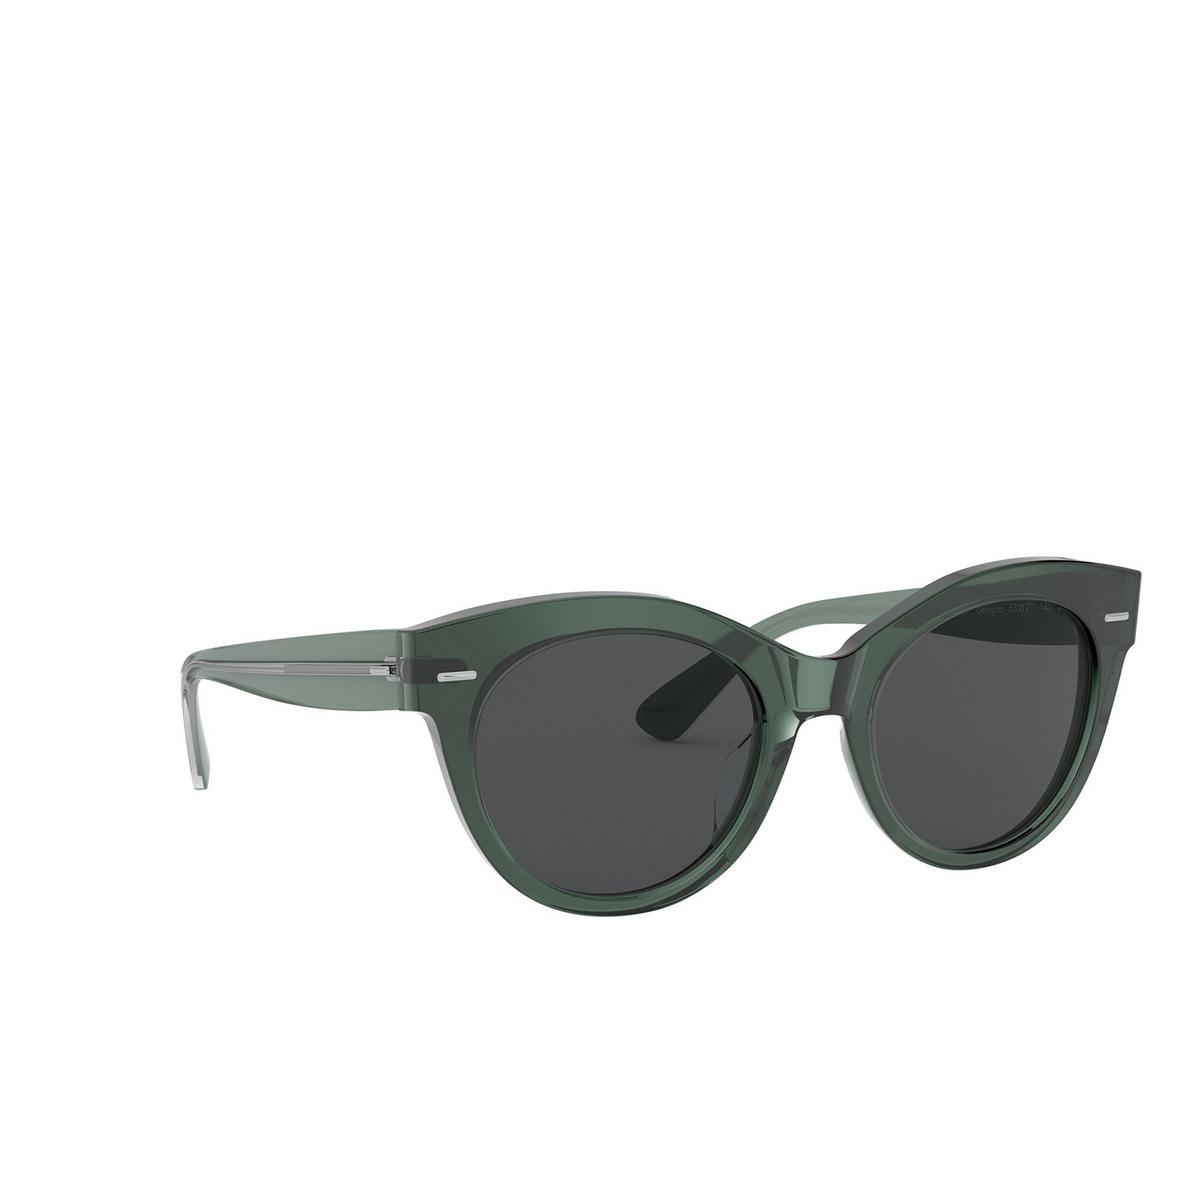 Oliver Peoples® Round Sunglasses: Georgica OV5421SU color Ivy 154787 - three-quarters view.